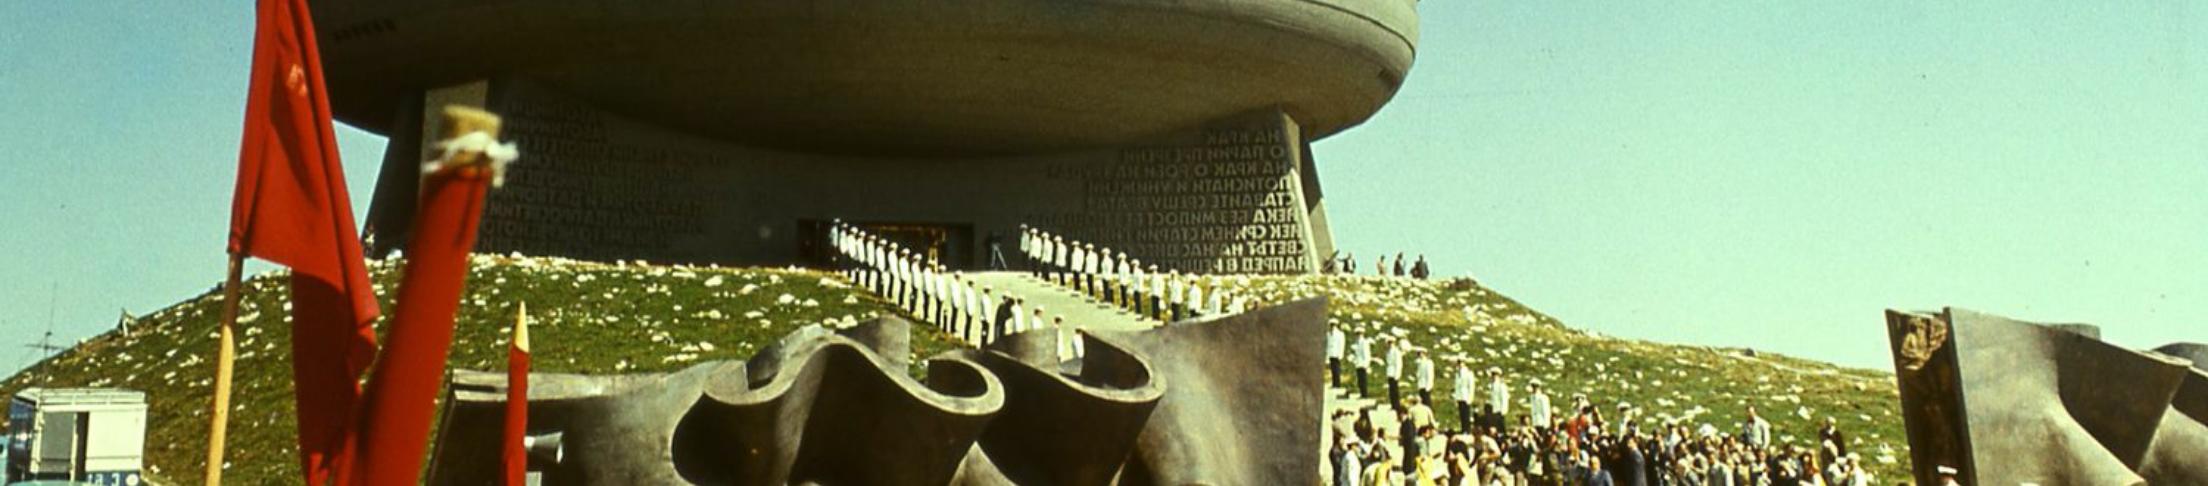 The opening ceremony at Buzludzha Peak on 23 August 1981.